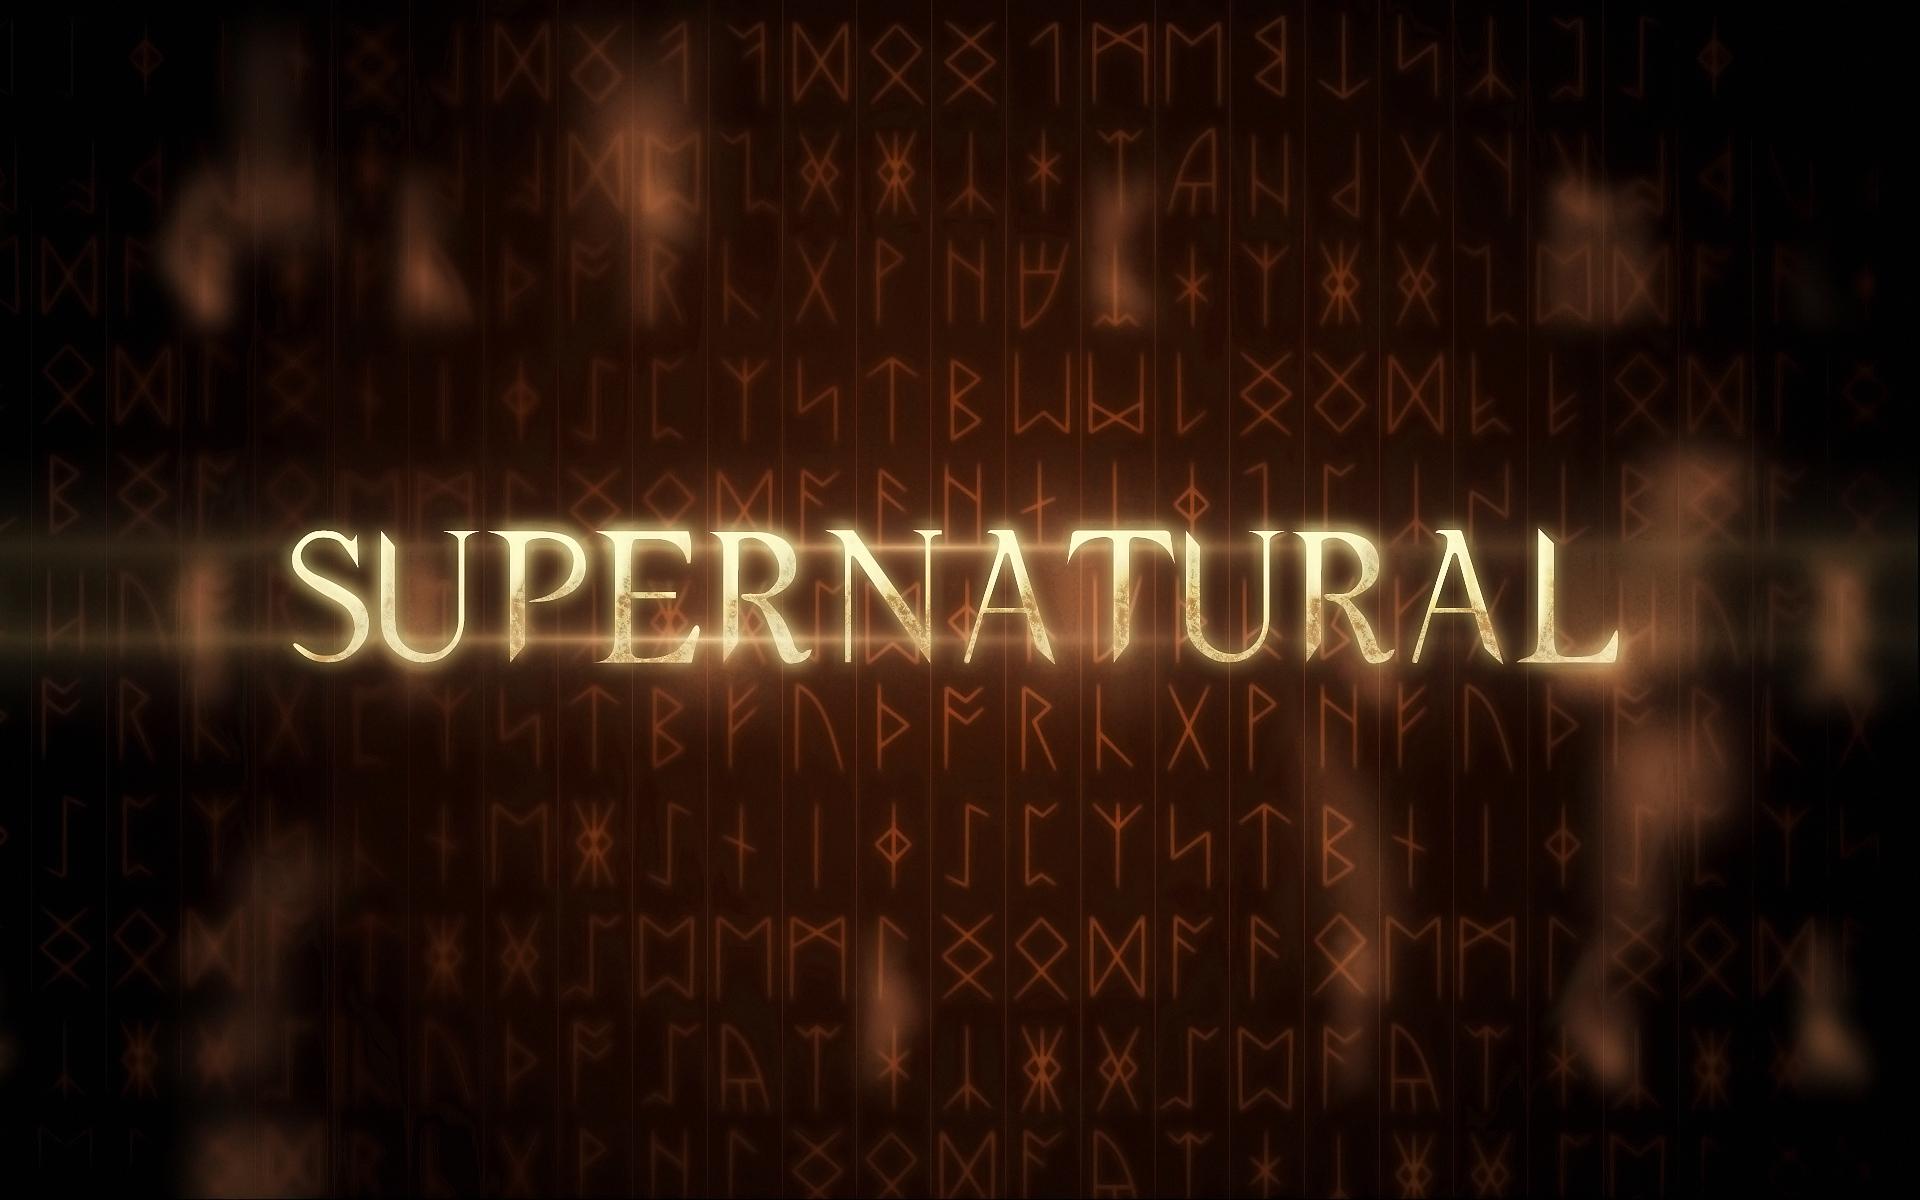 Supernatural Season 8 Wallpaper HD by iNicKeoN